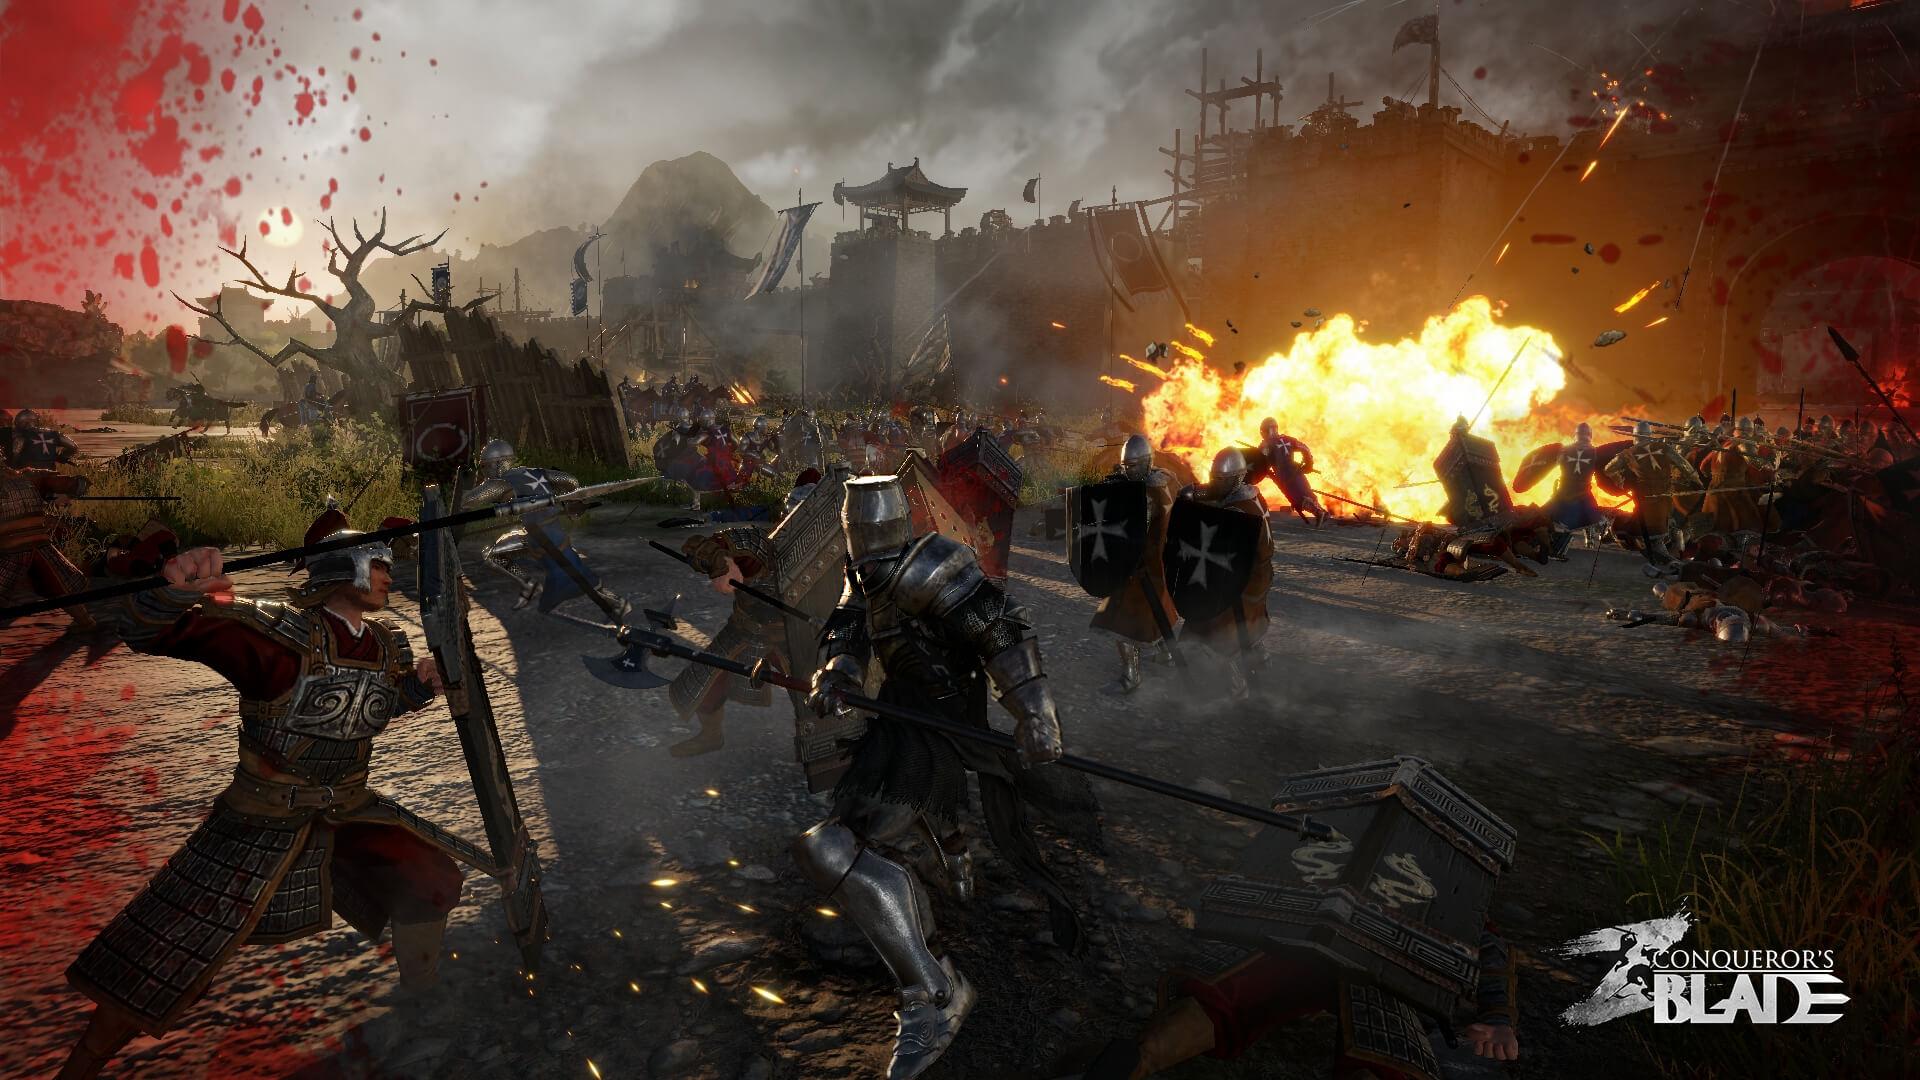 Conquerors Blade beta 01